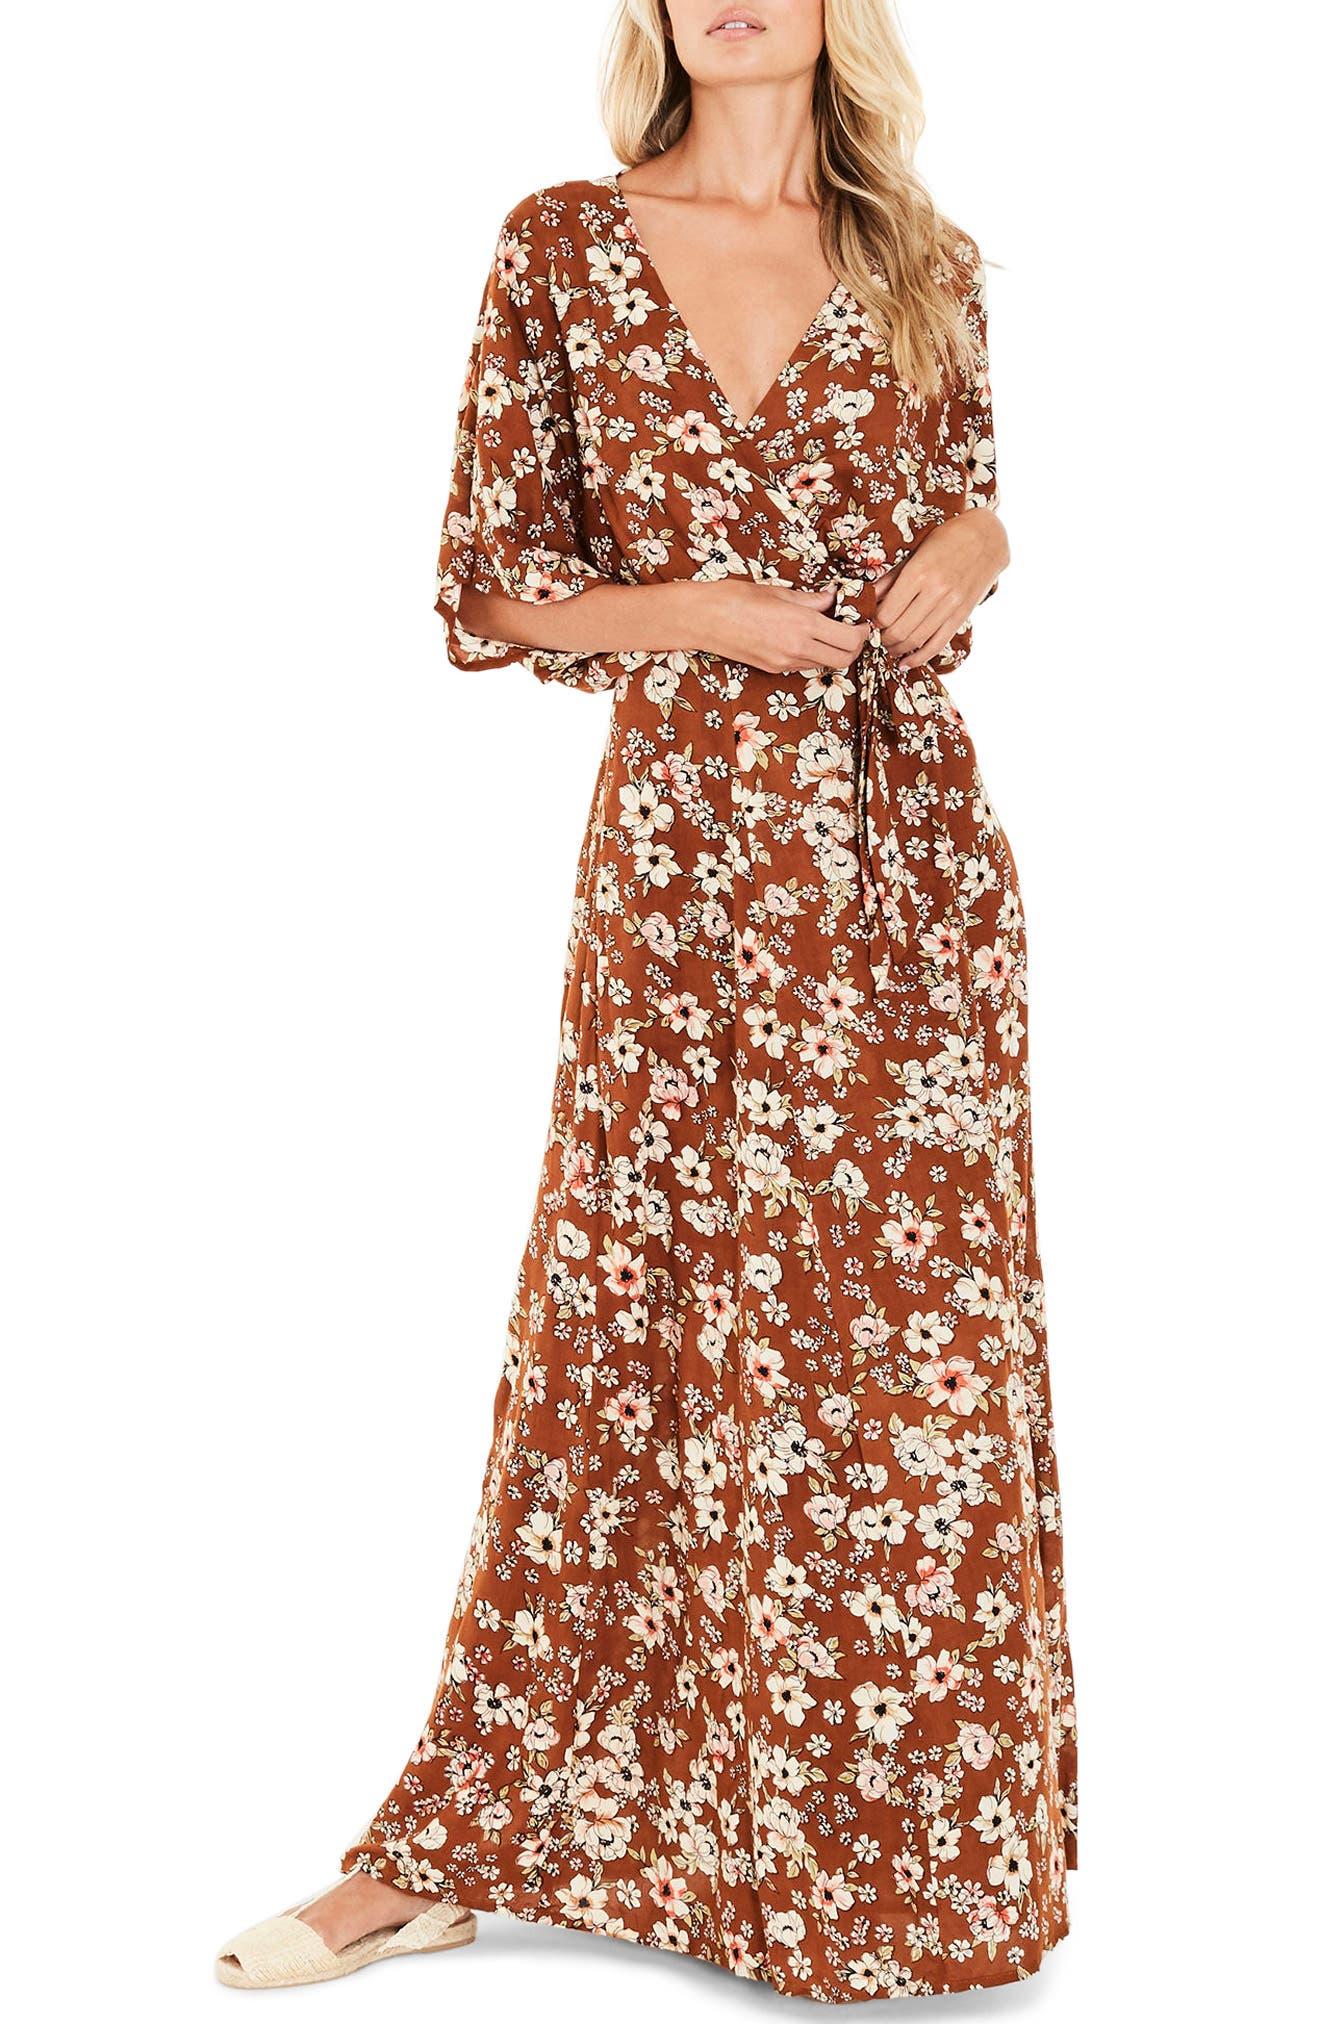 Bergamo Maxi Wrap Dress,                             Main thumbnail 1, color,                             650